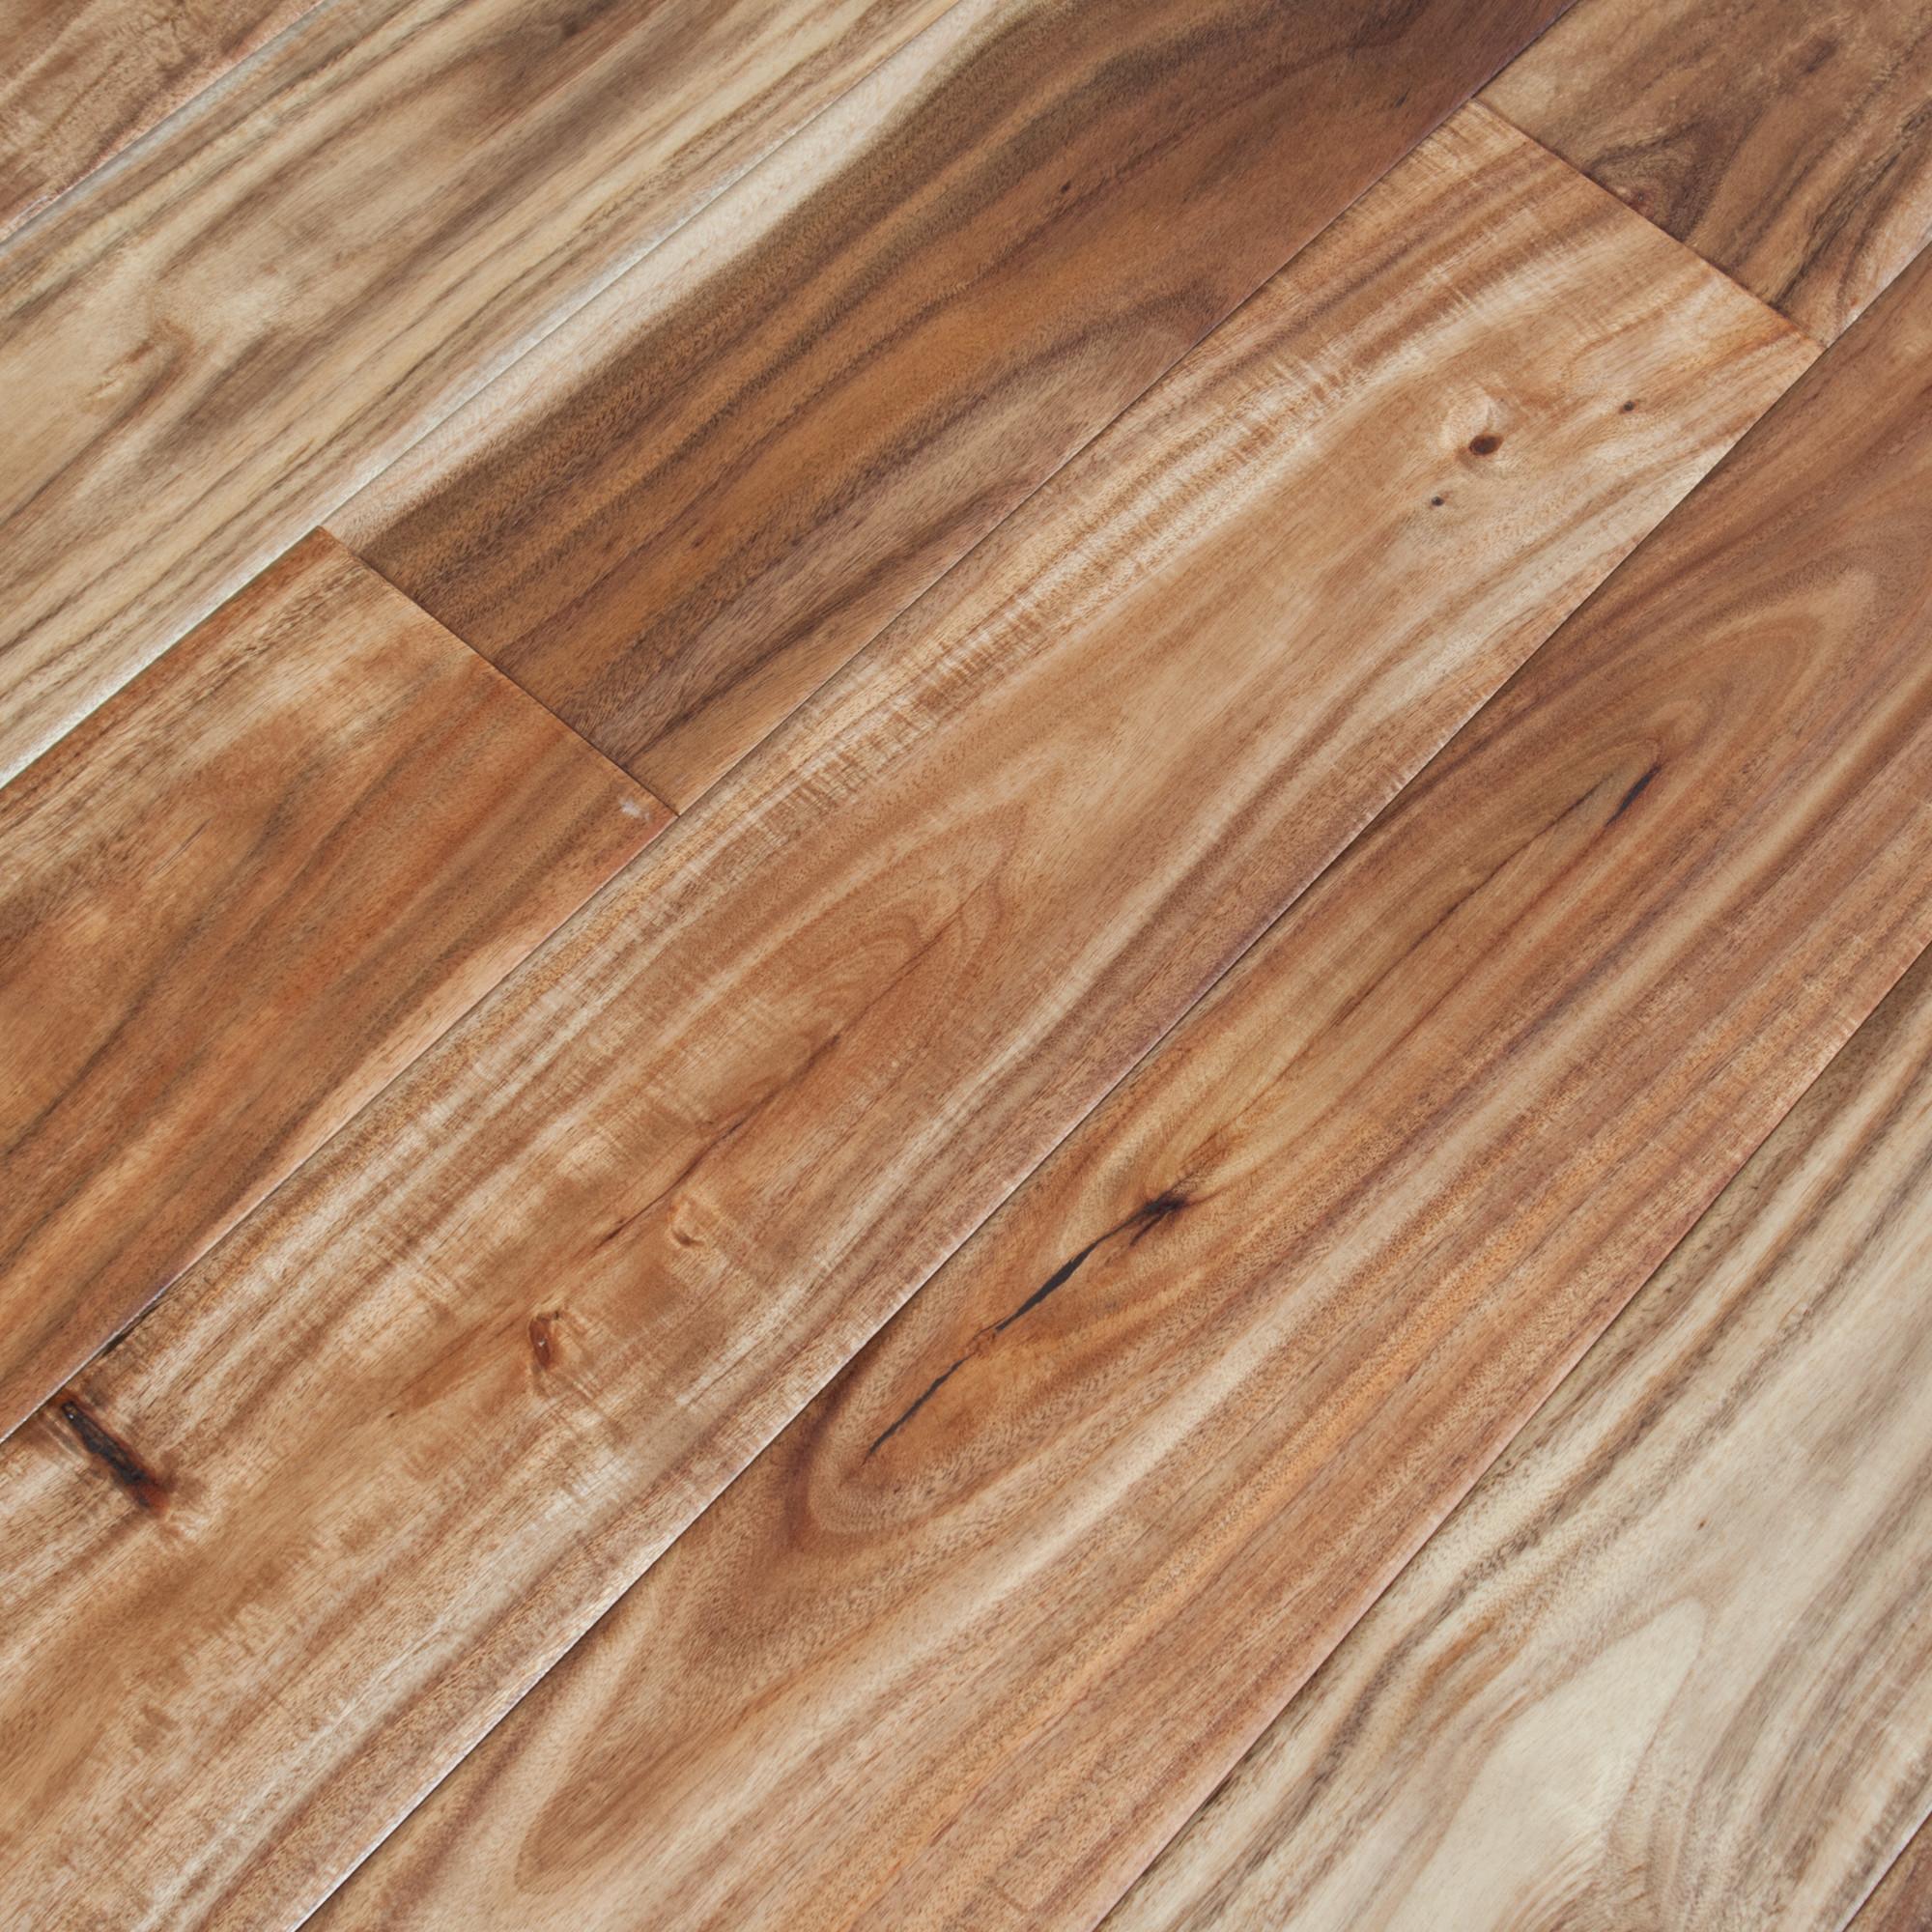 5 hand scraped hardwood flooring of 9 mile creek acacia hand scraped acacia confusa wood floors inside acacia handscraped natural hardwood flooring